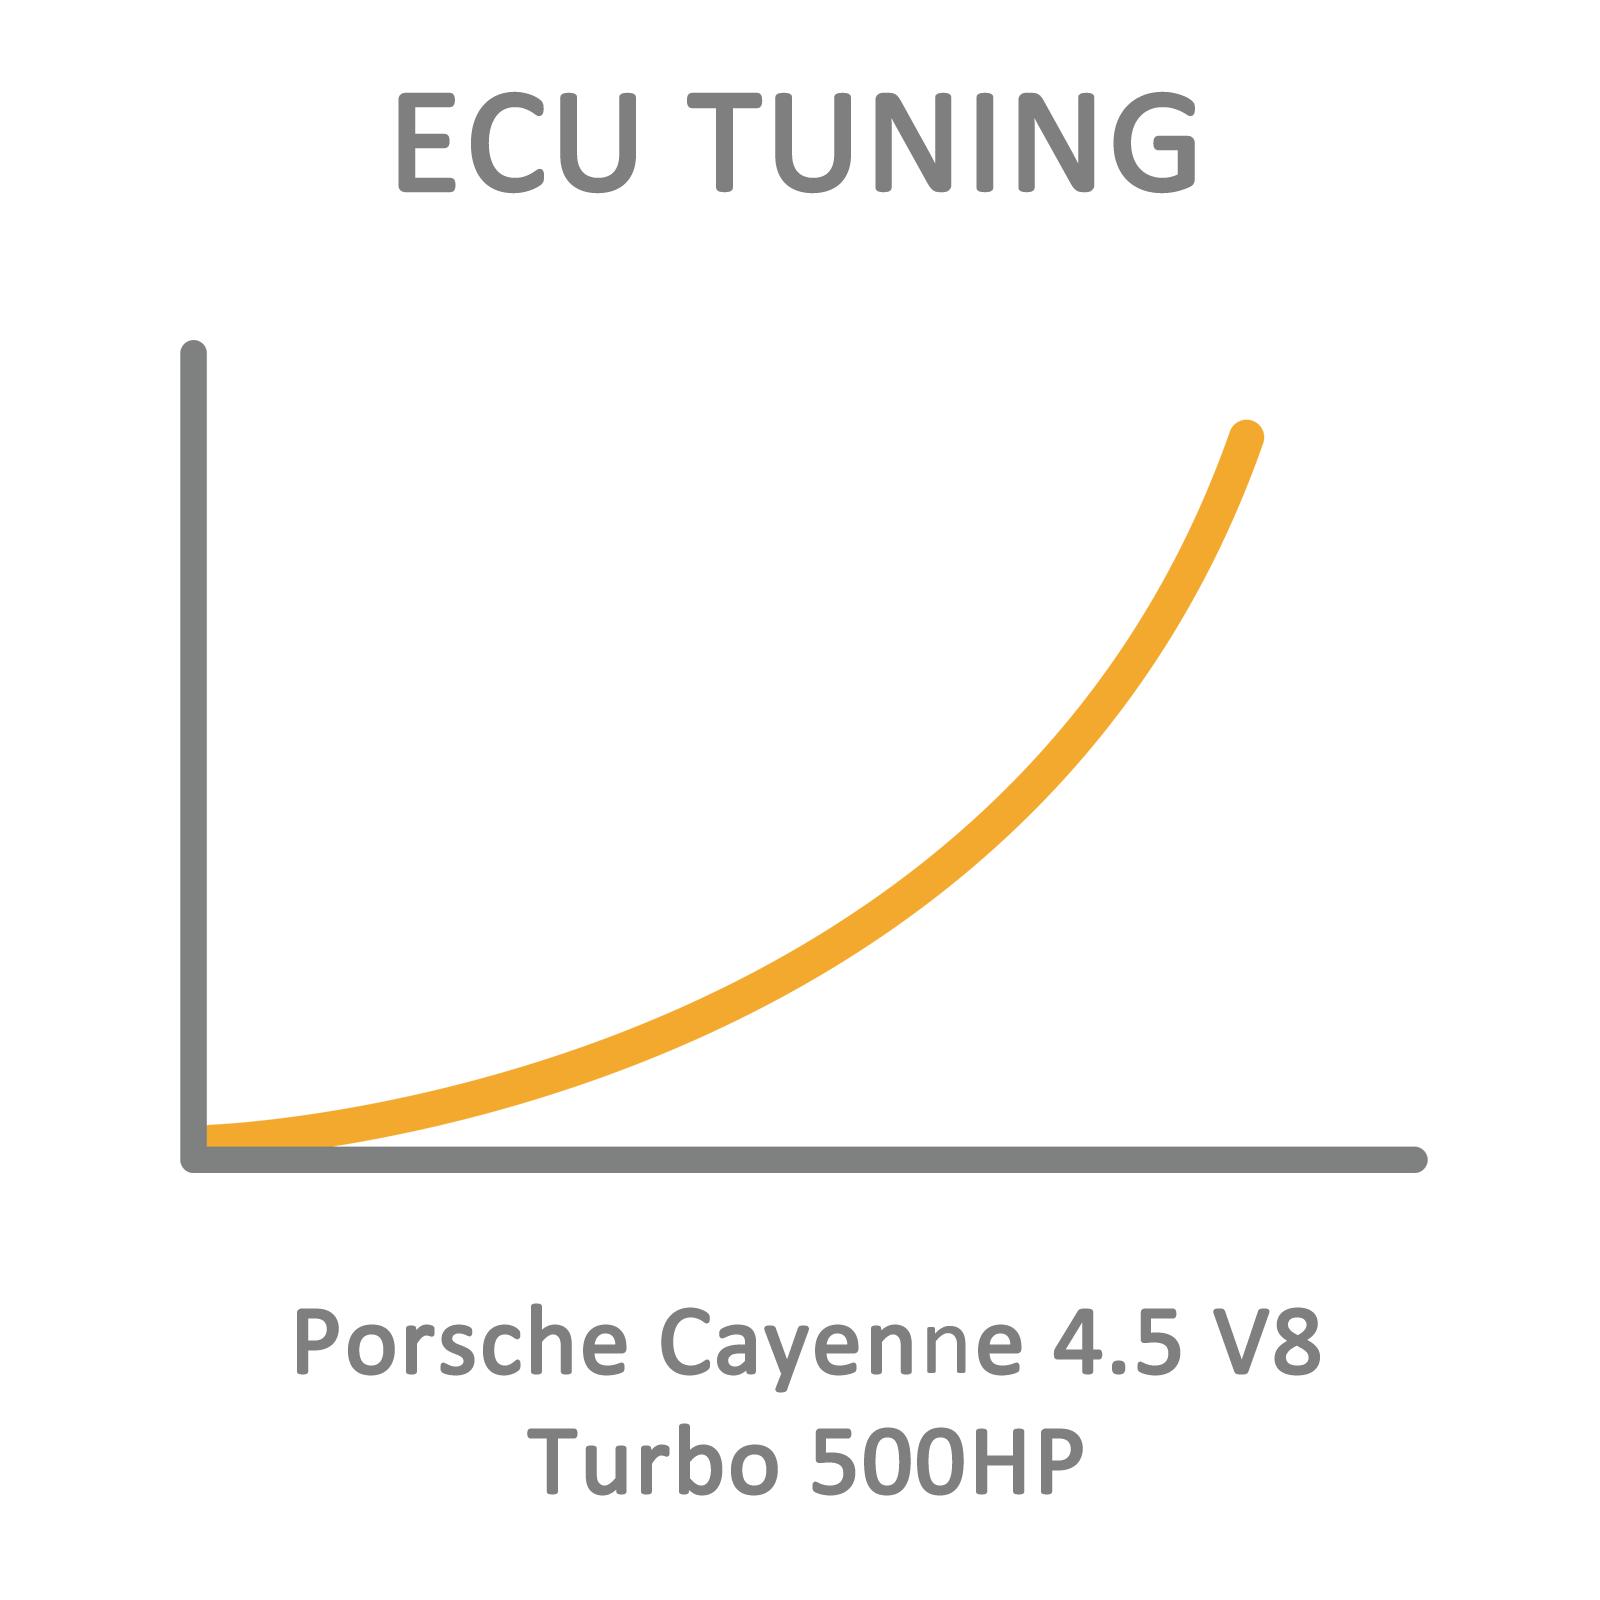 Porsche Cayenne 4.5 V8 Turbo 500HP ECU Tuning Remapping